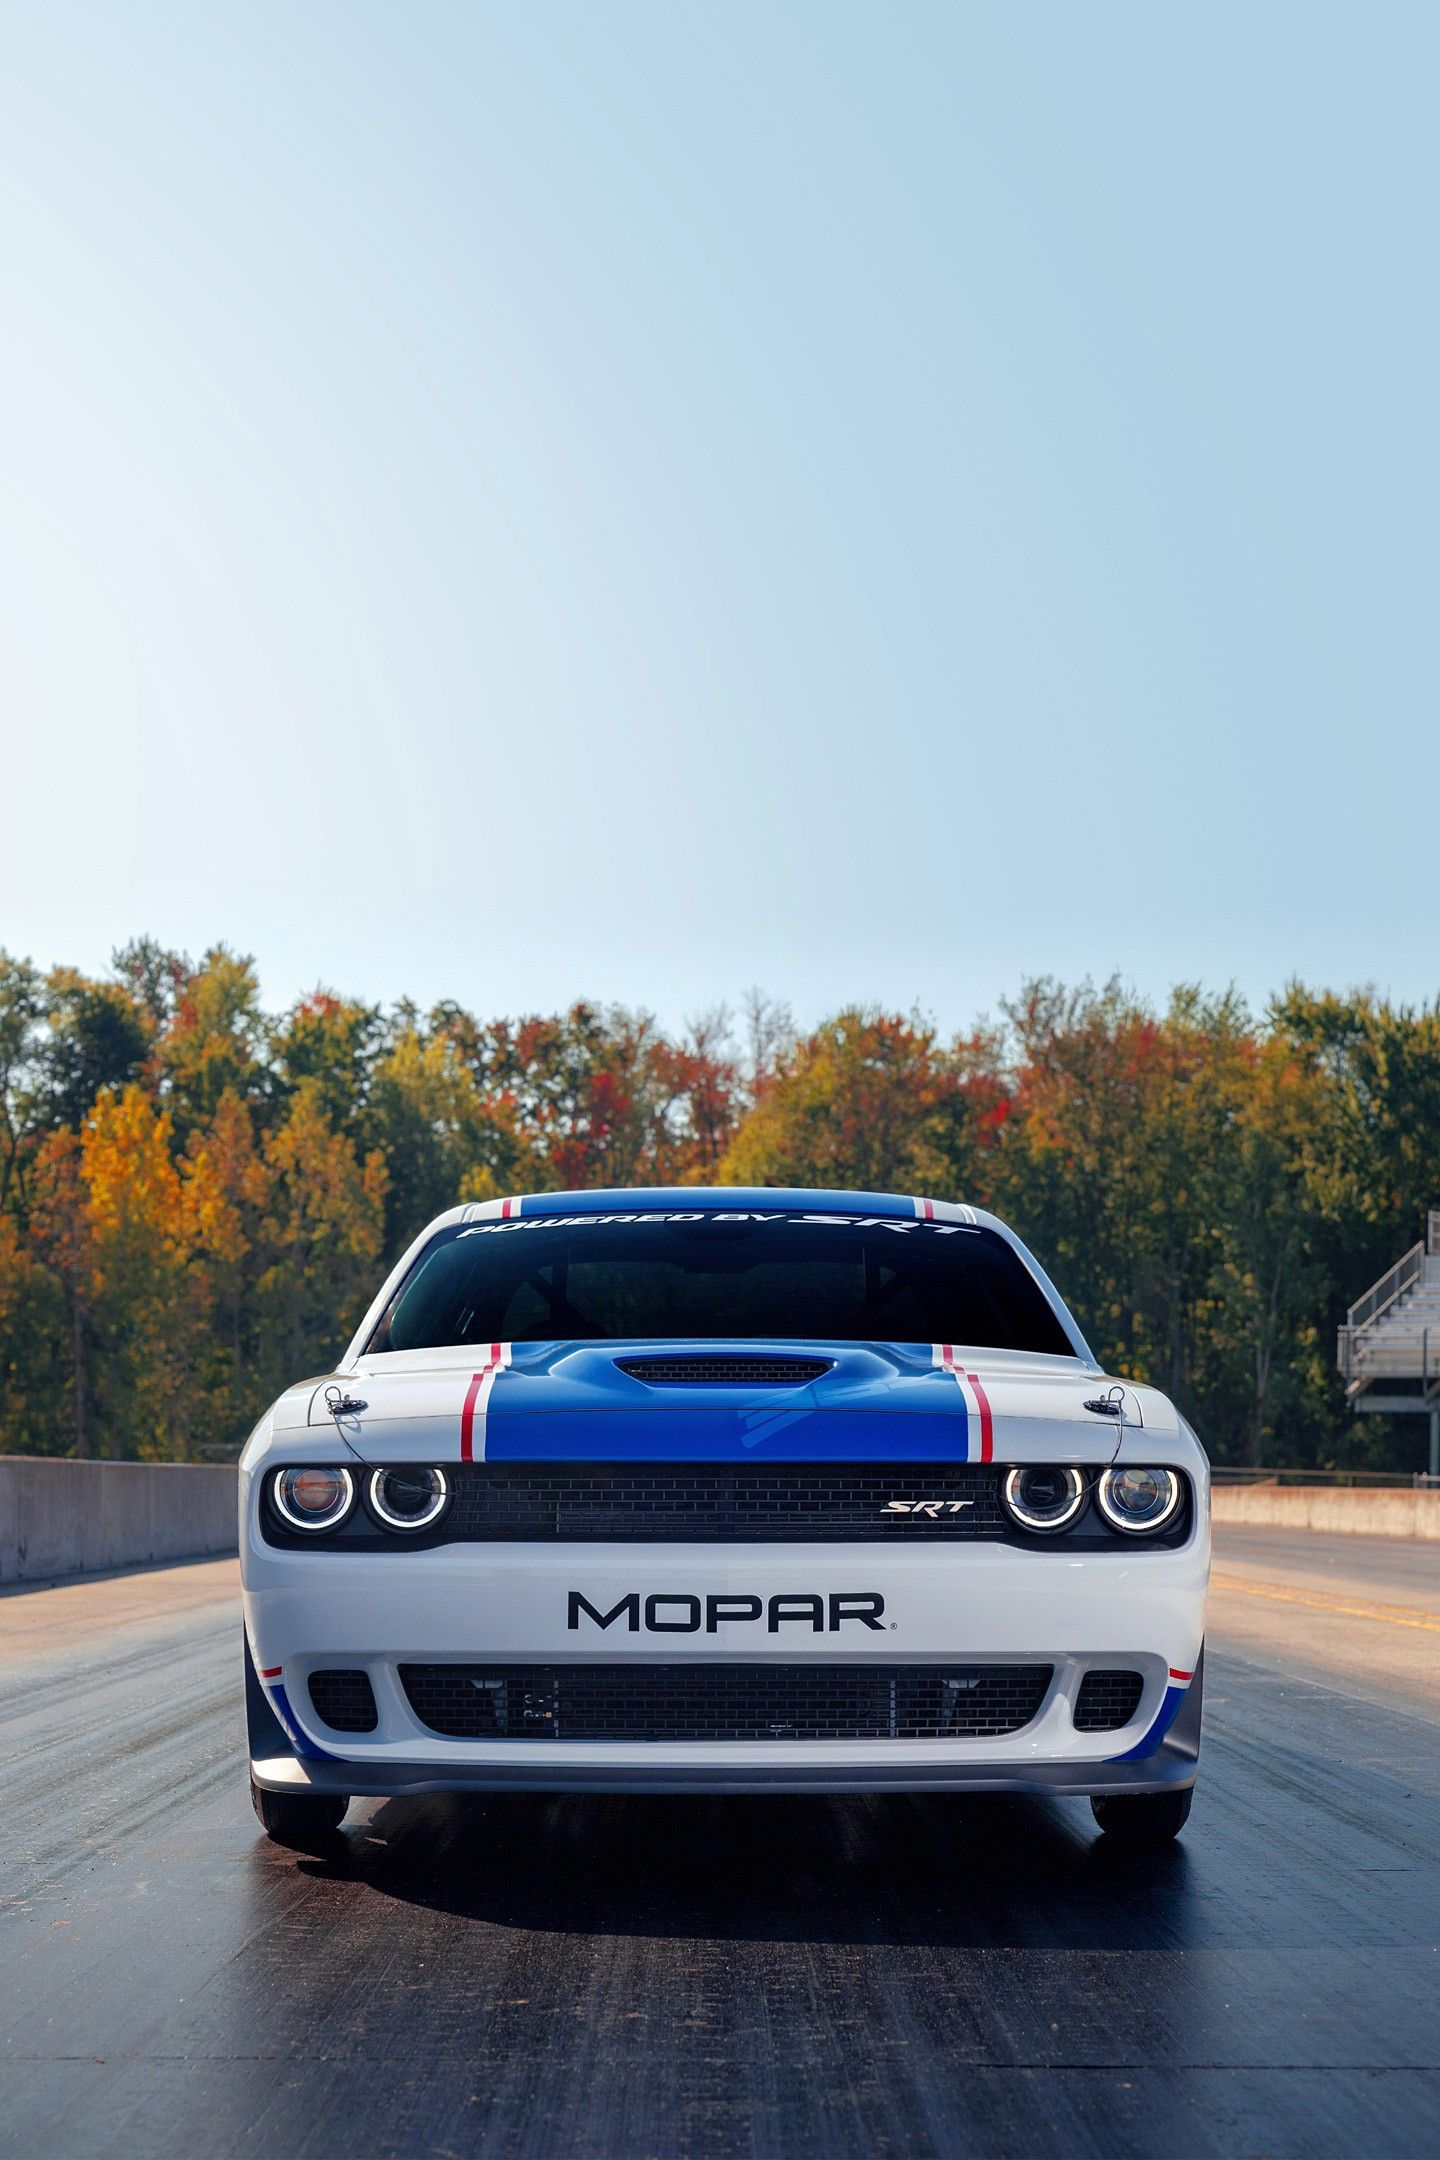 Dodge Challenger Drag Pak UHD Wallpapers 21X21 in 21   Dodge ...